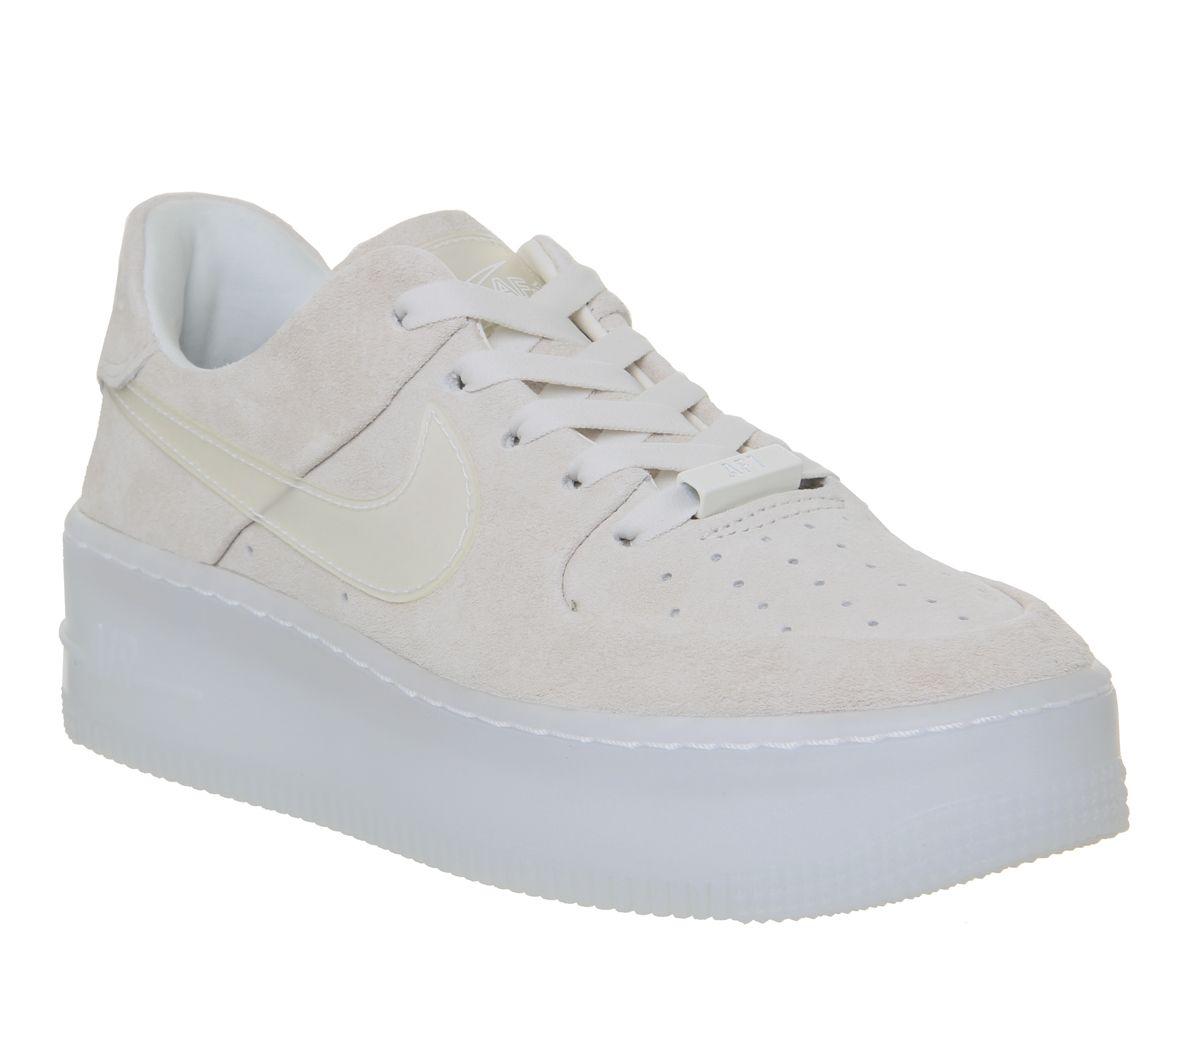 27e7520e4b Nike Air Force 1 Sage Trainers Phantom White Irridescent - Hers trainers